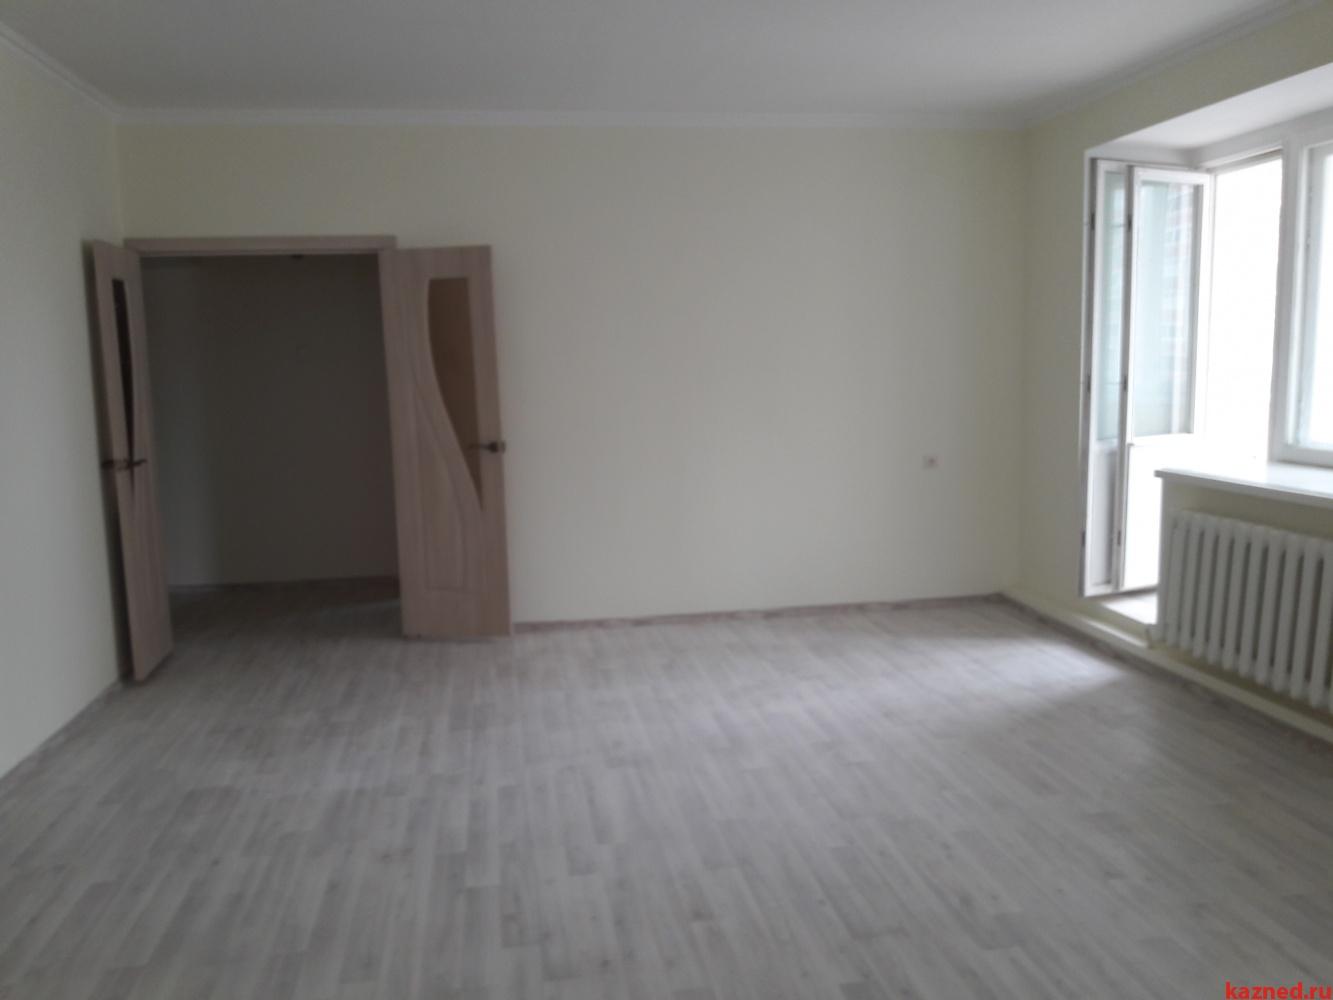 Продажа 3-к квартиры Карбышева,  67, 120 м2  (миниатюра №11)